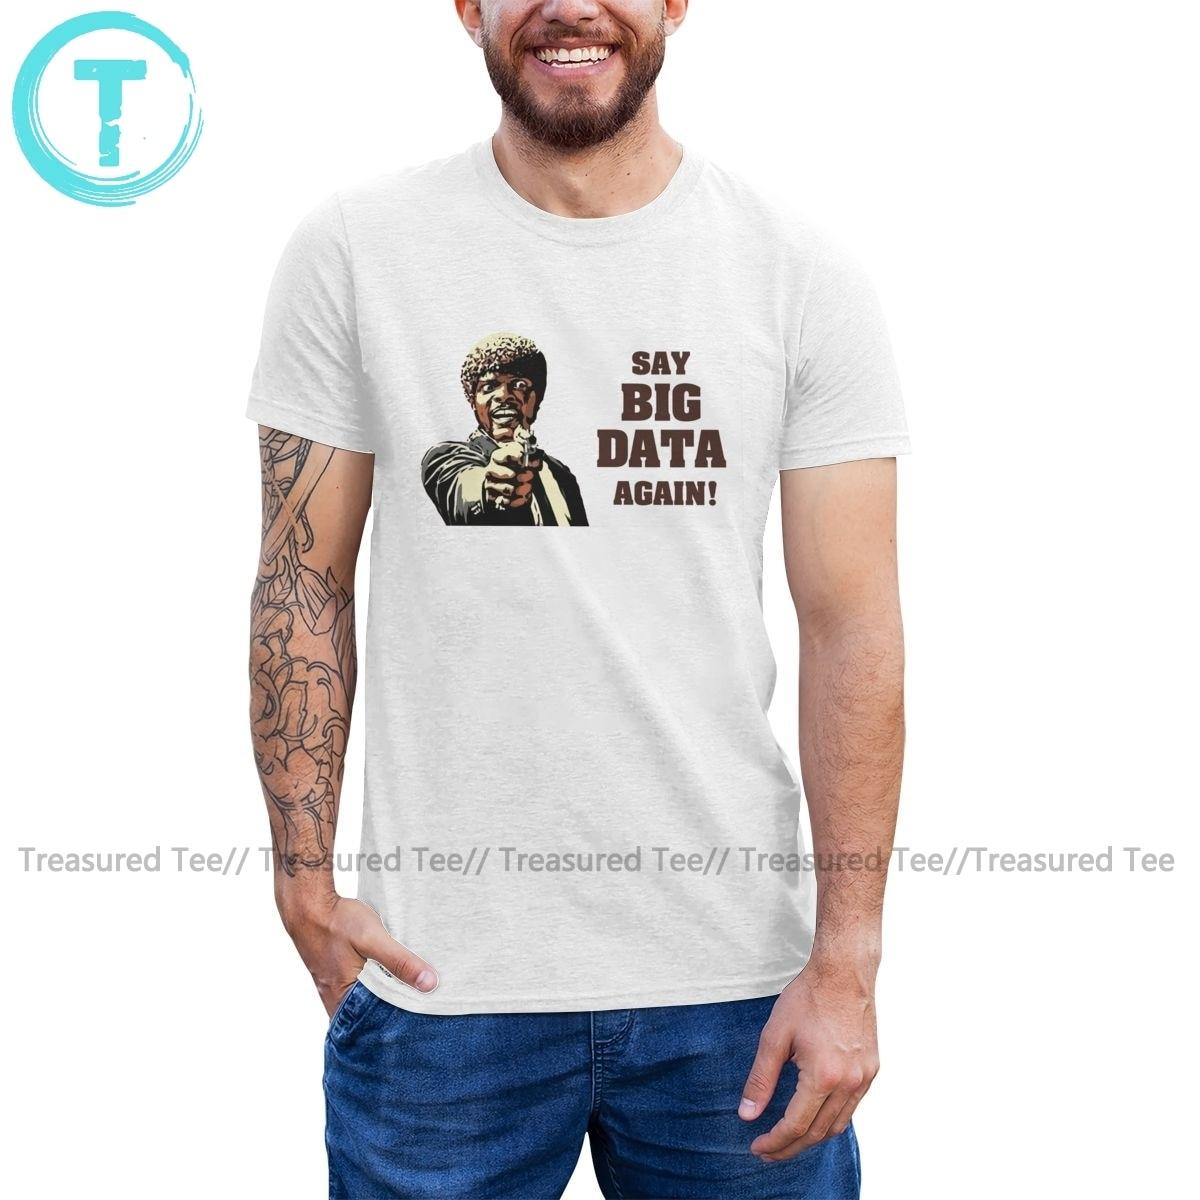 Camiseta de Pulp Fiction Say BIG DATA Again, camiseta de manga corta 100 algodón, camiseta gráfica clásica